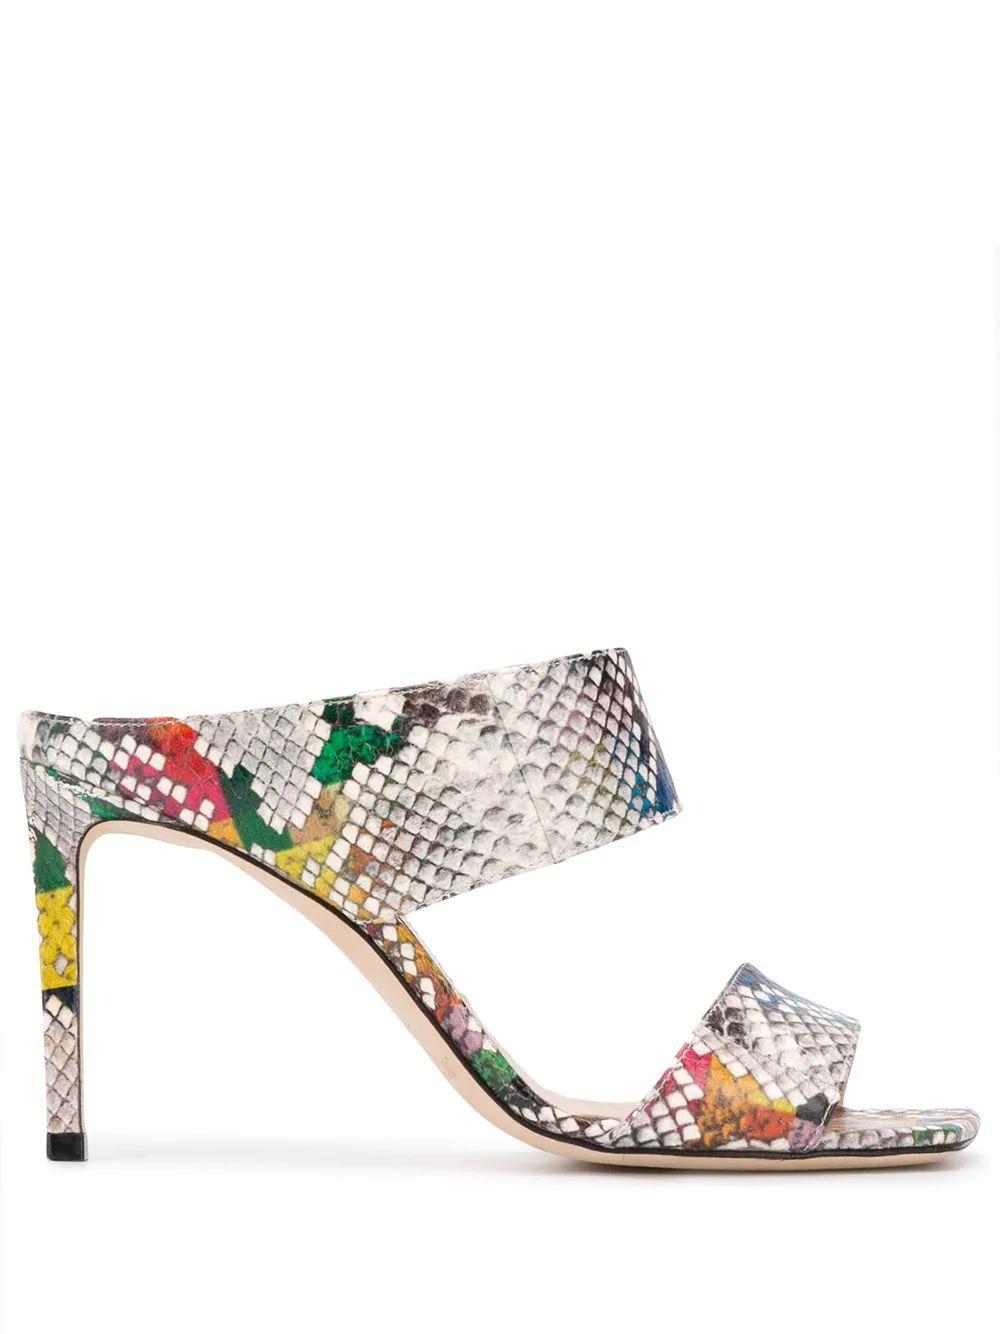 Glossy Rainbow Snake 85mm 2- Strap Sandal Item # HIRA85-YDD